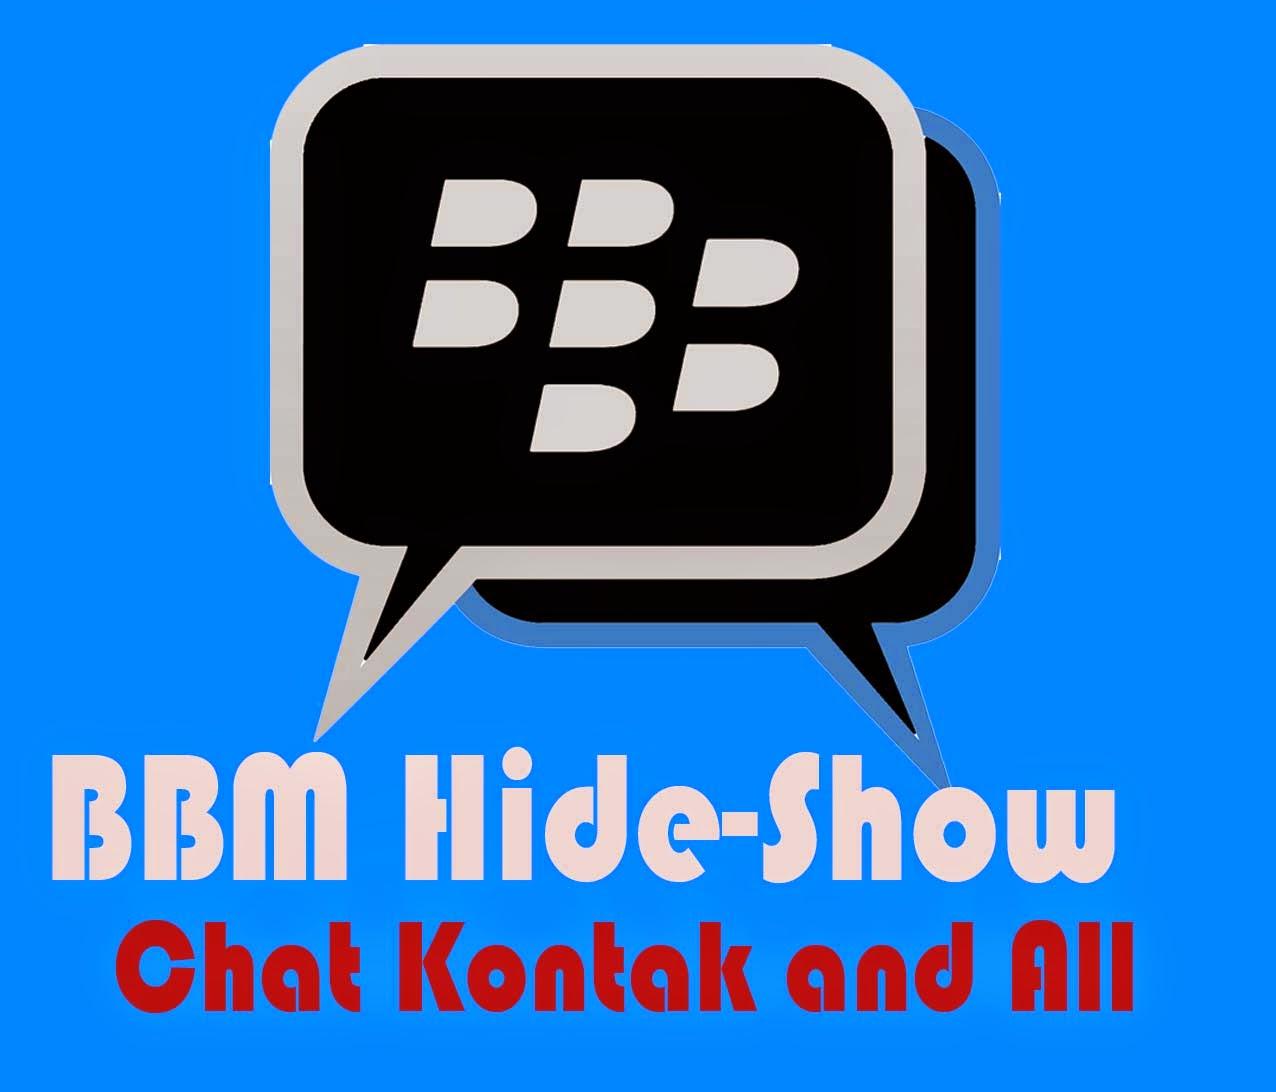 BBM mod hide show data chat kontak all